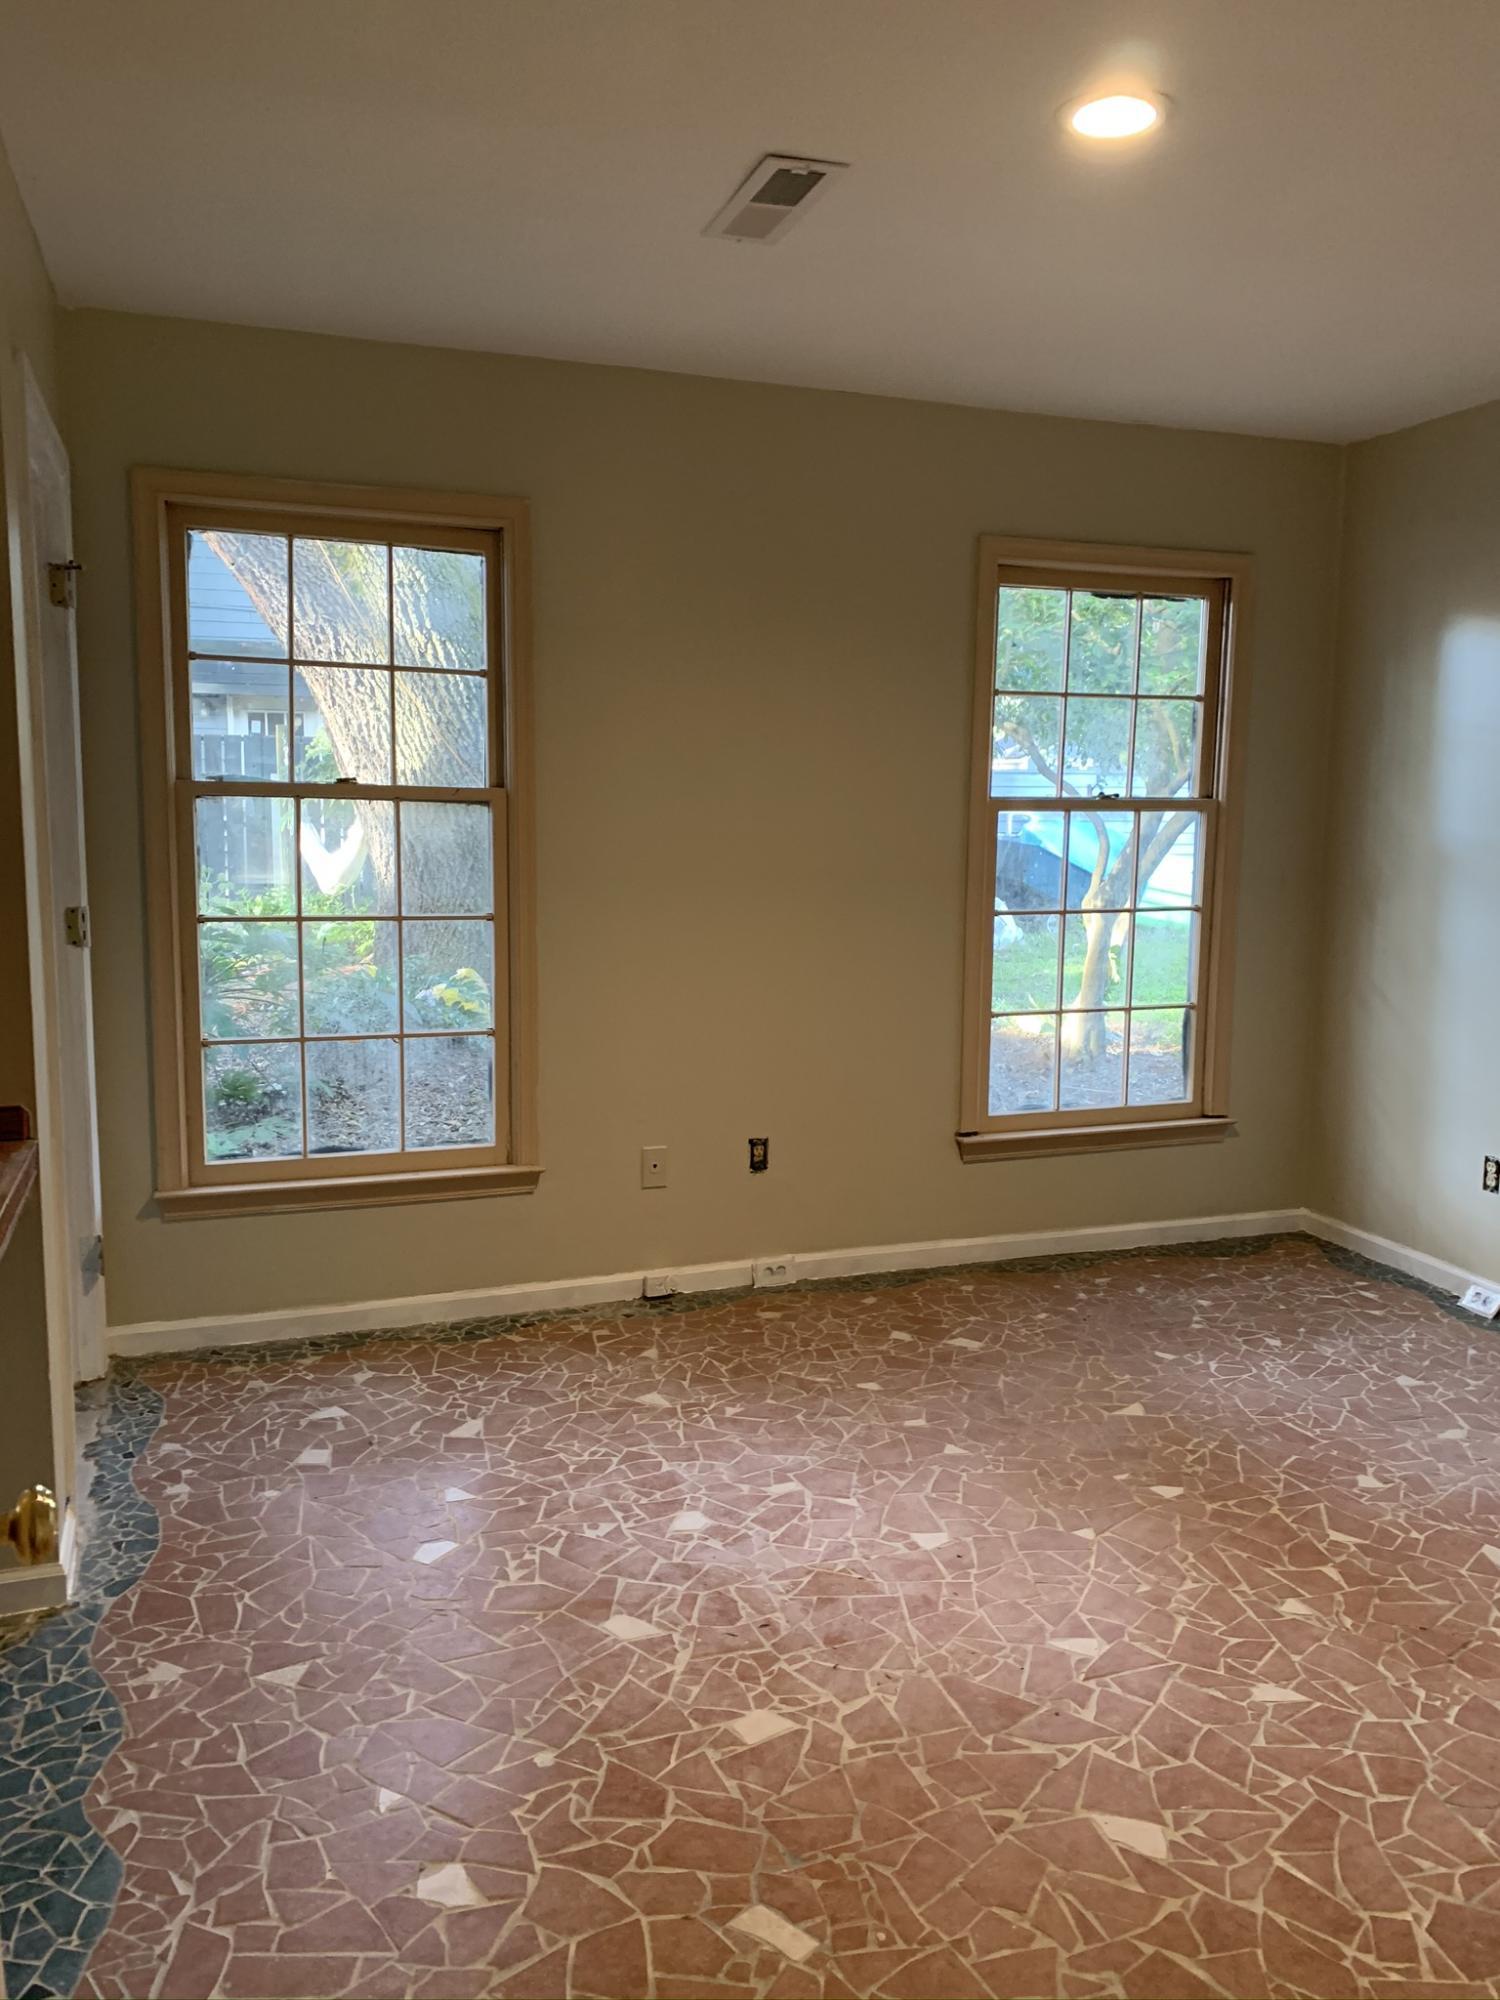 Fox Pond Homes For Sale - 662 Poaug, Mount Pleasant, SC - 5